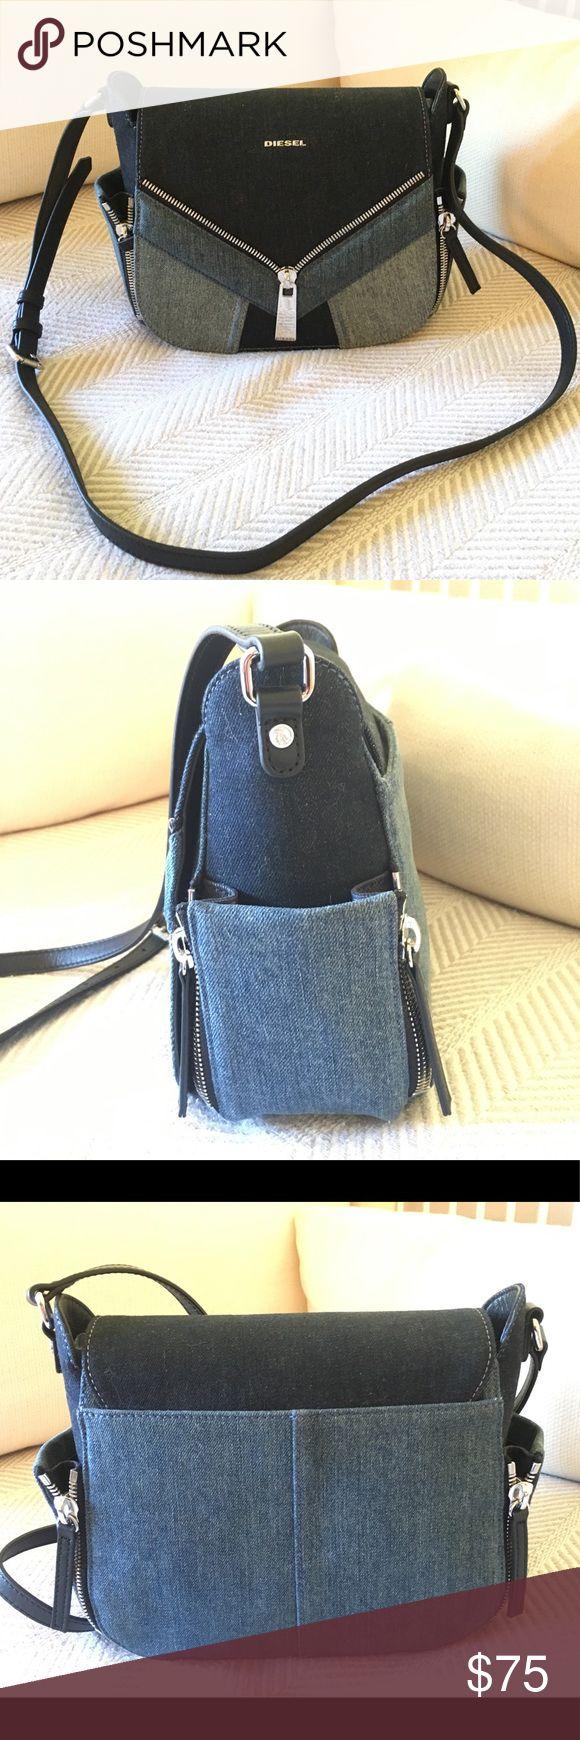 DIESEL CROSSBODY BAG DENIM DIESEL CROSSBODY BAG Light wash denim/dark wash denim Silver hardware Literally brand new/never used Still has plastic on inside Two side pockets   #diesel #denimbag #bag #crossbodybag #crossbody #bluebag #bluepurse #purse #silverbag #coachella Diesel Bags Crossbody Bags